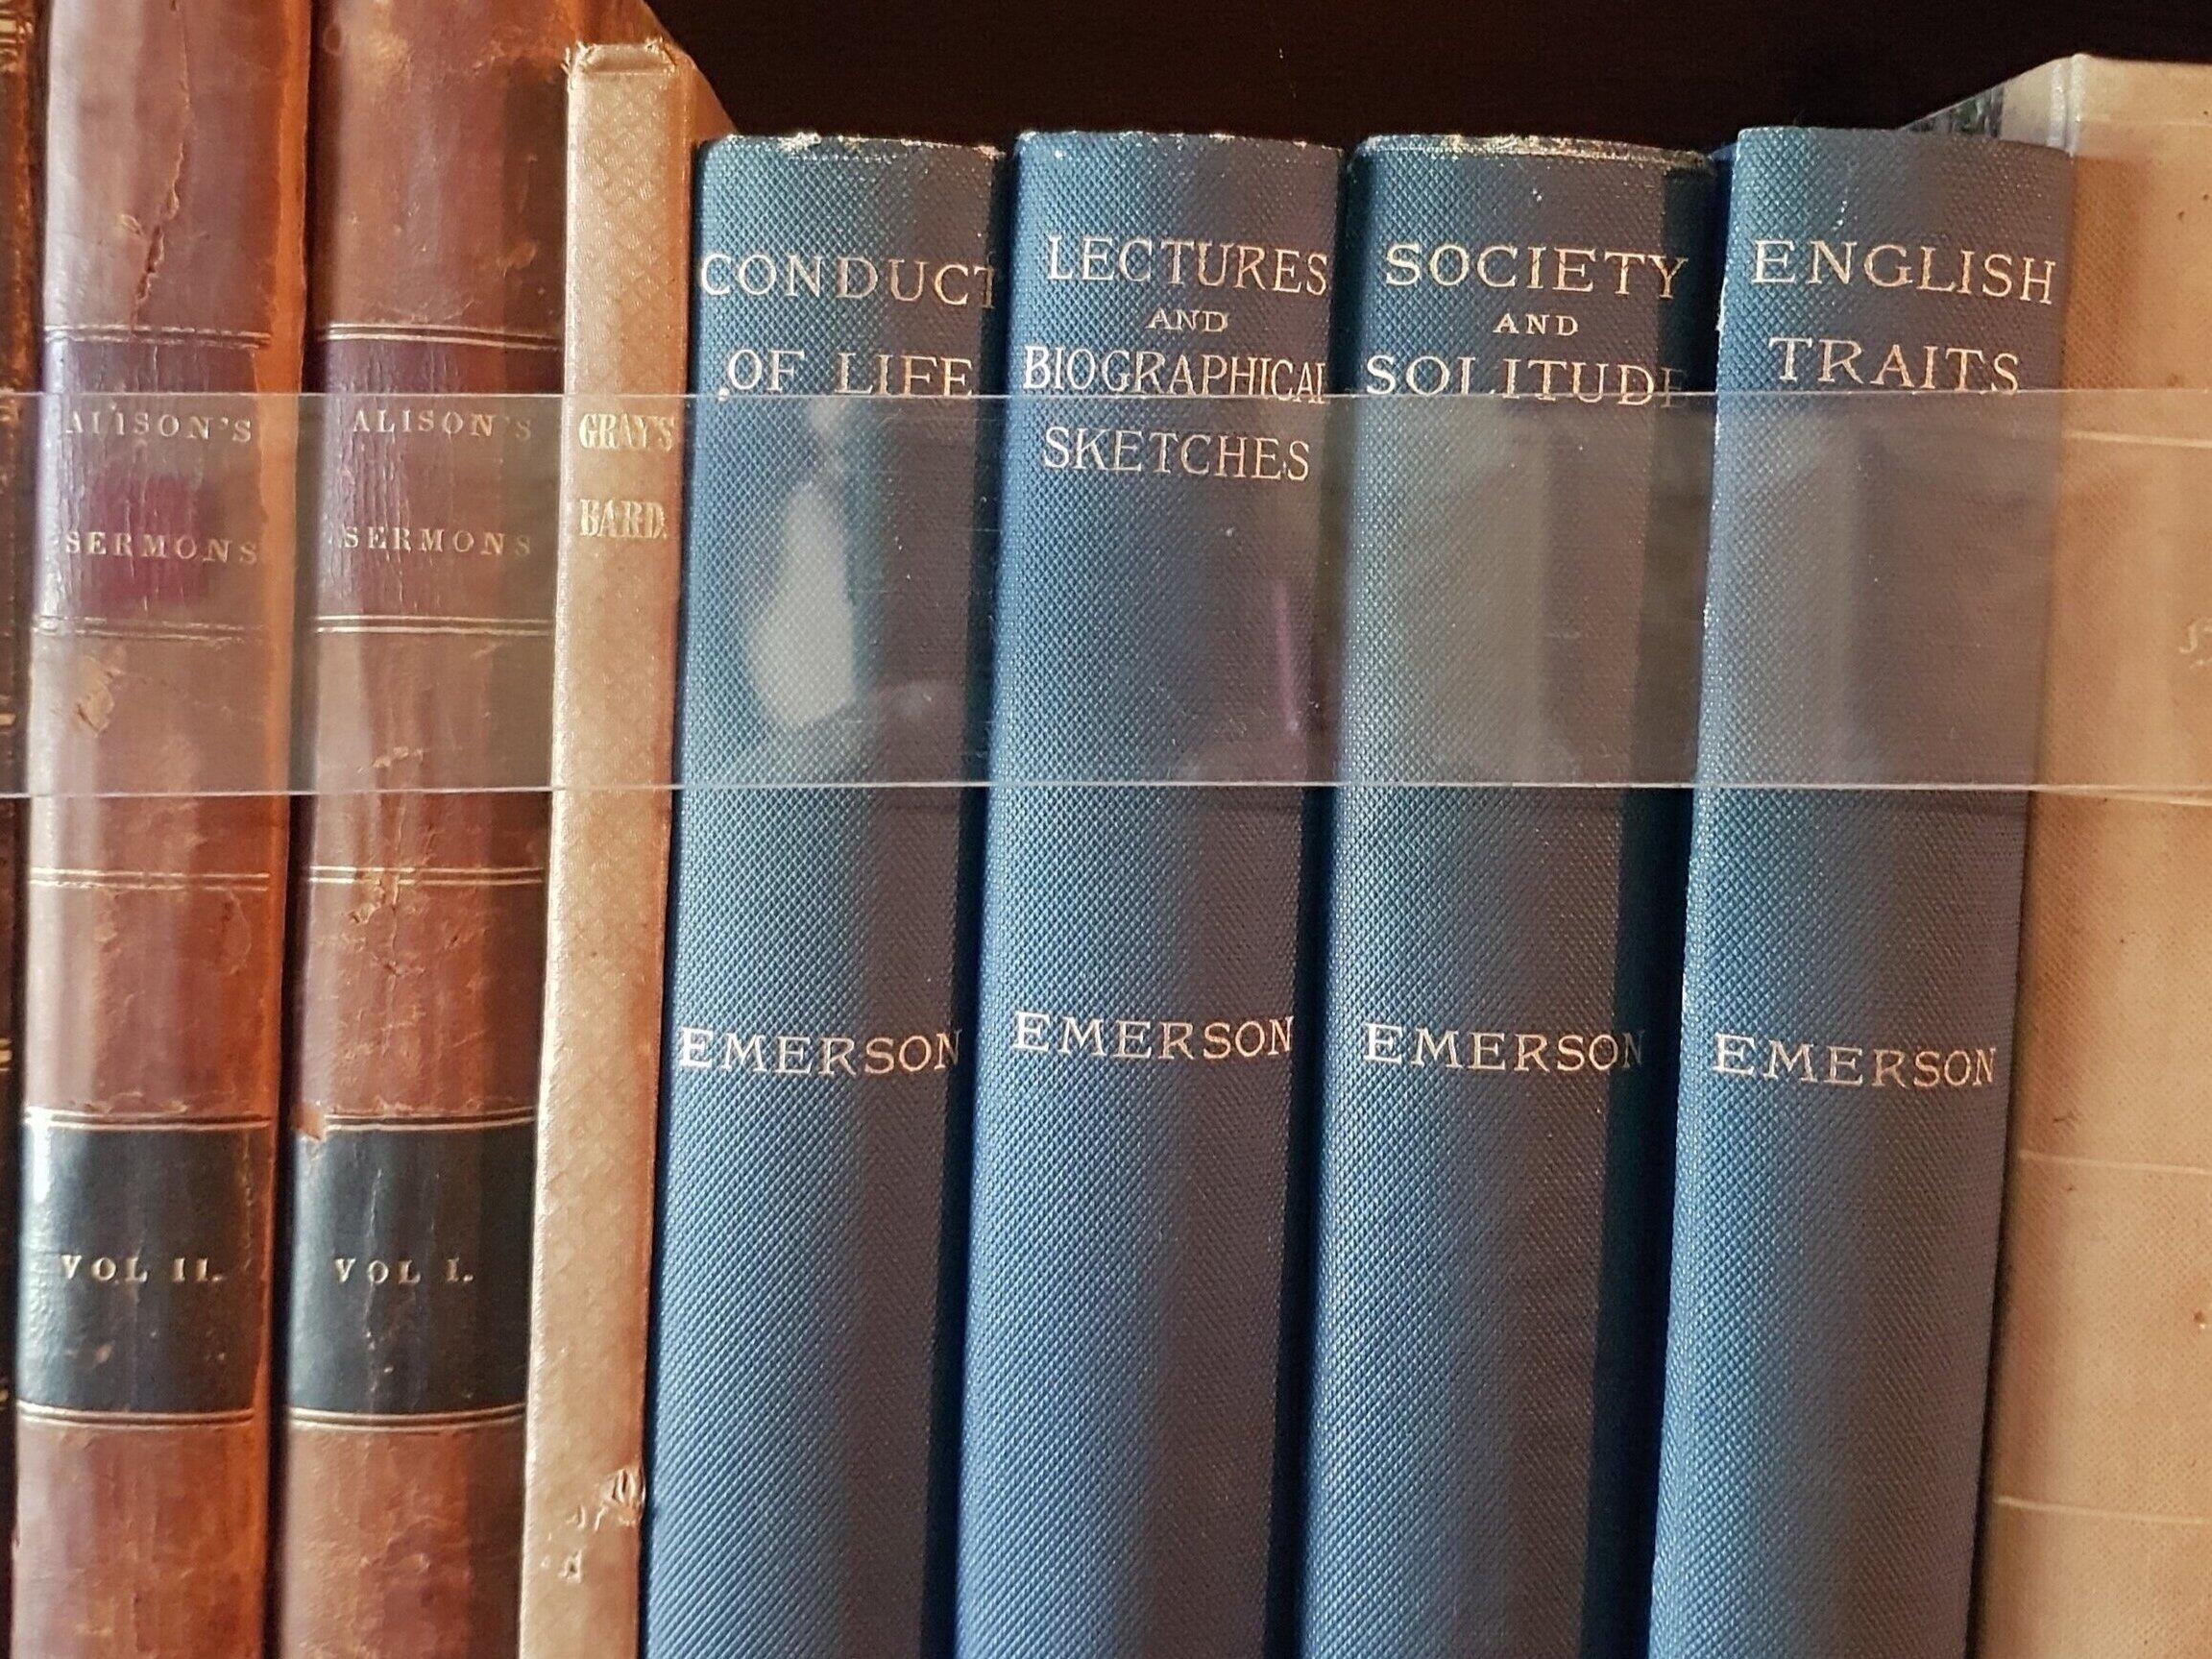 Emersonbooks.jpg